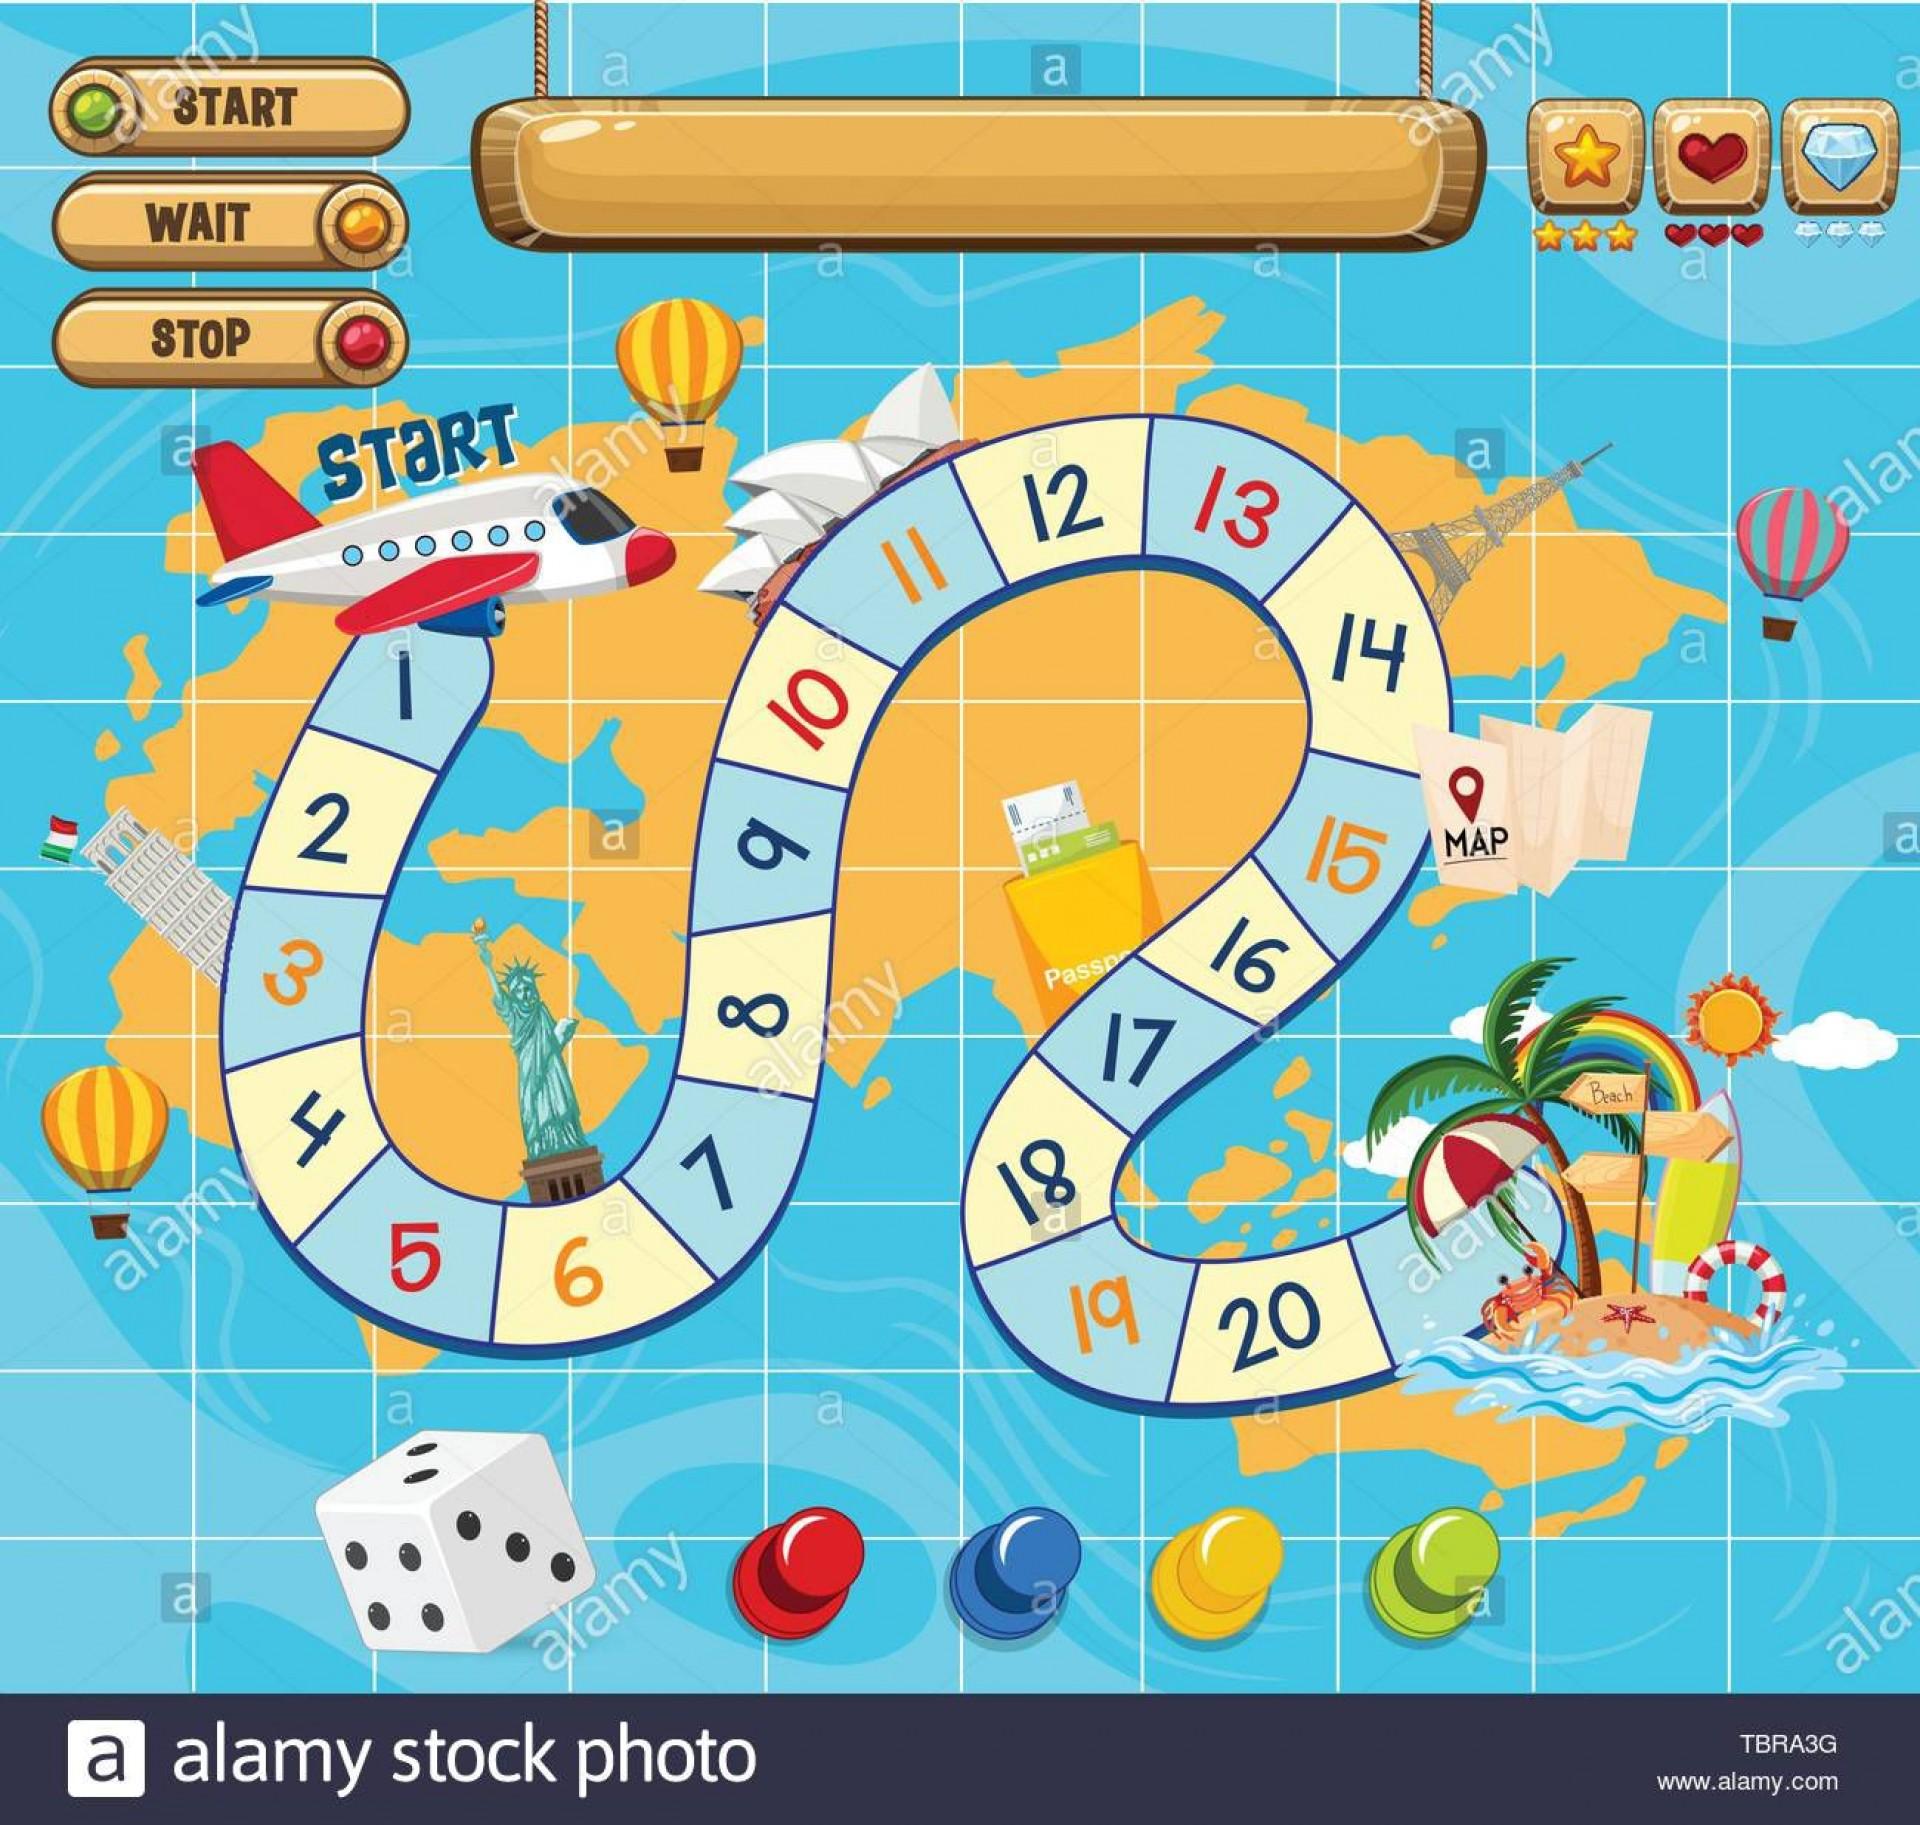 006 Amazing Editable Board Game Template Idea  Word Blank Free1920